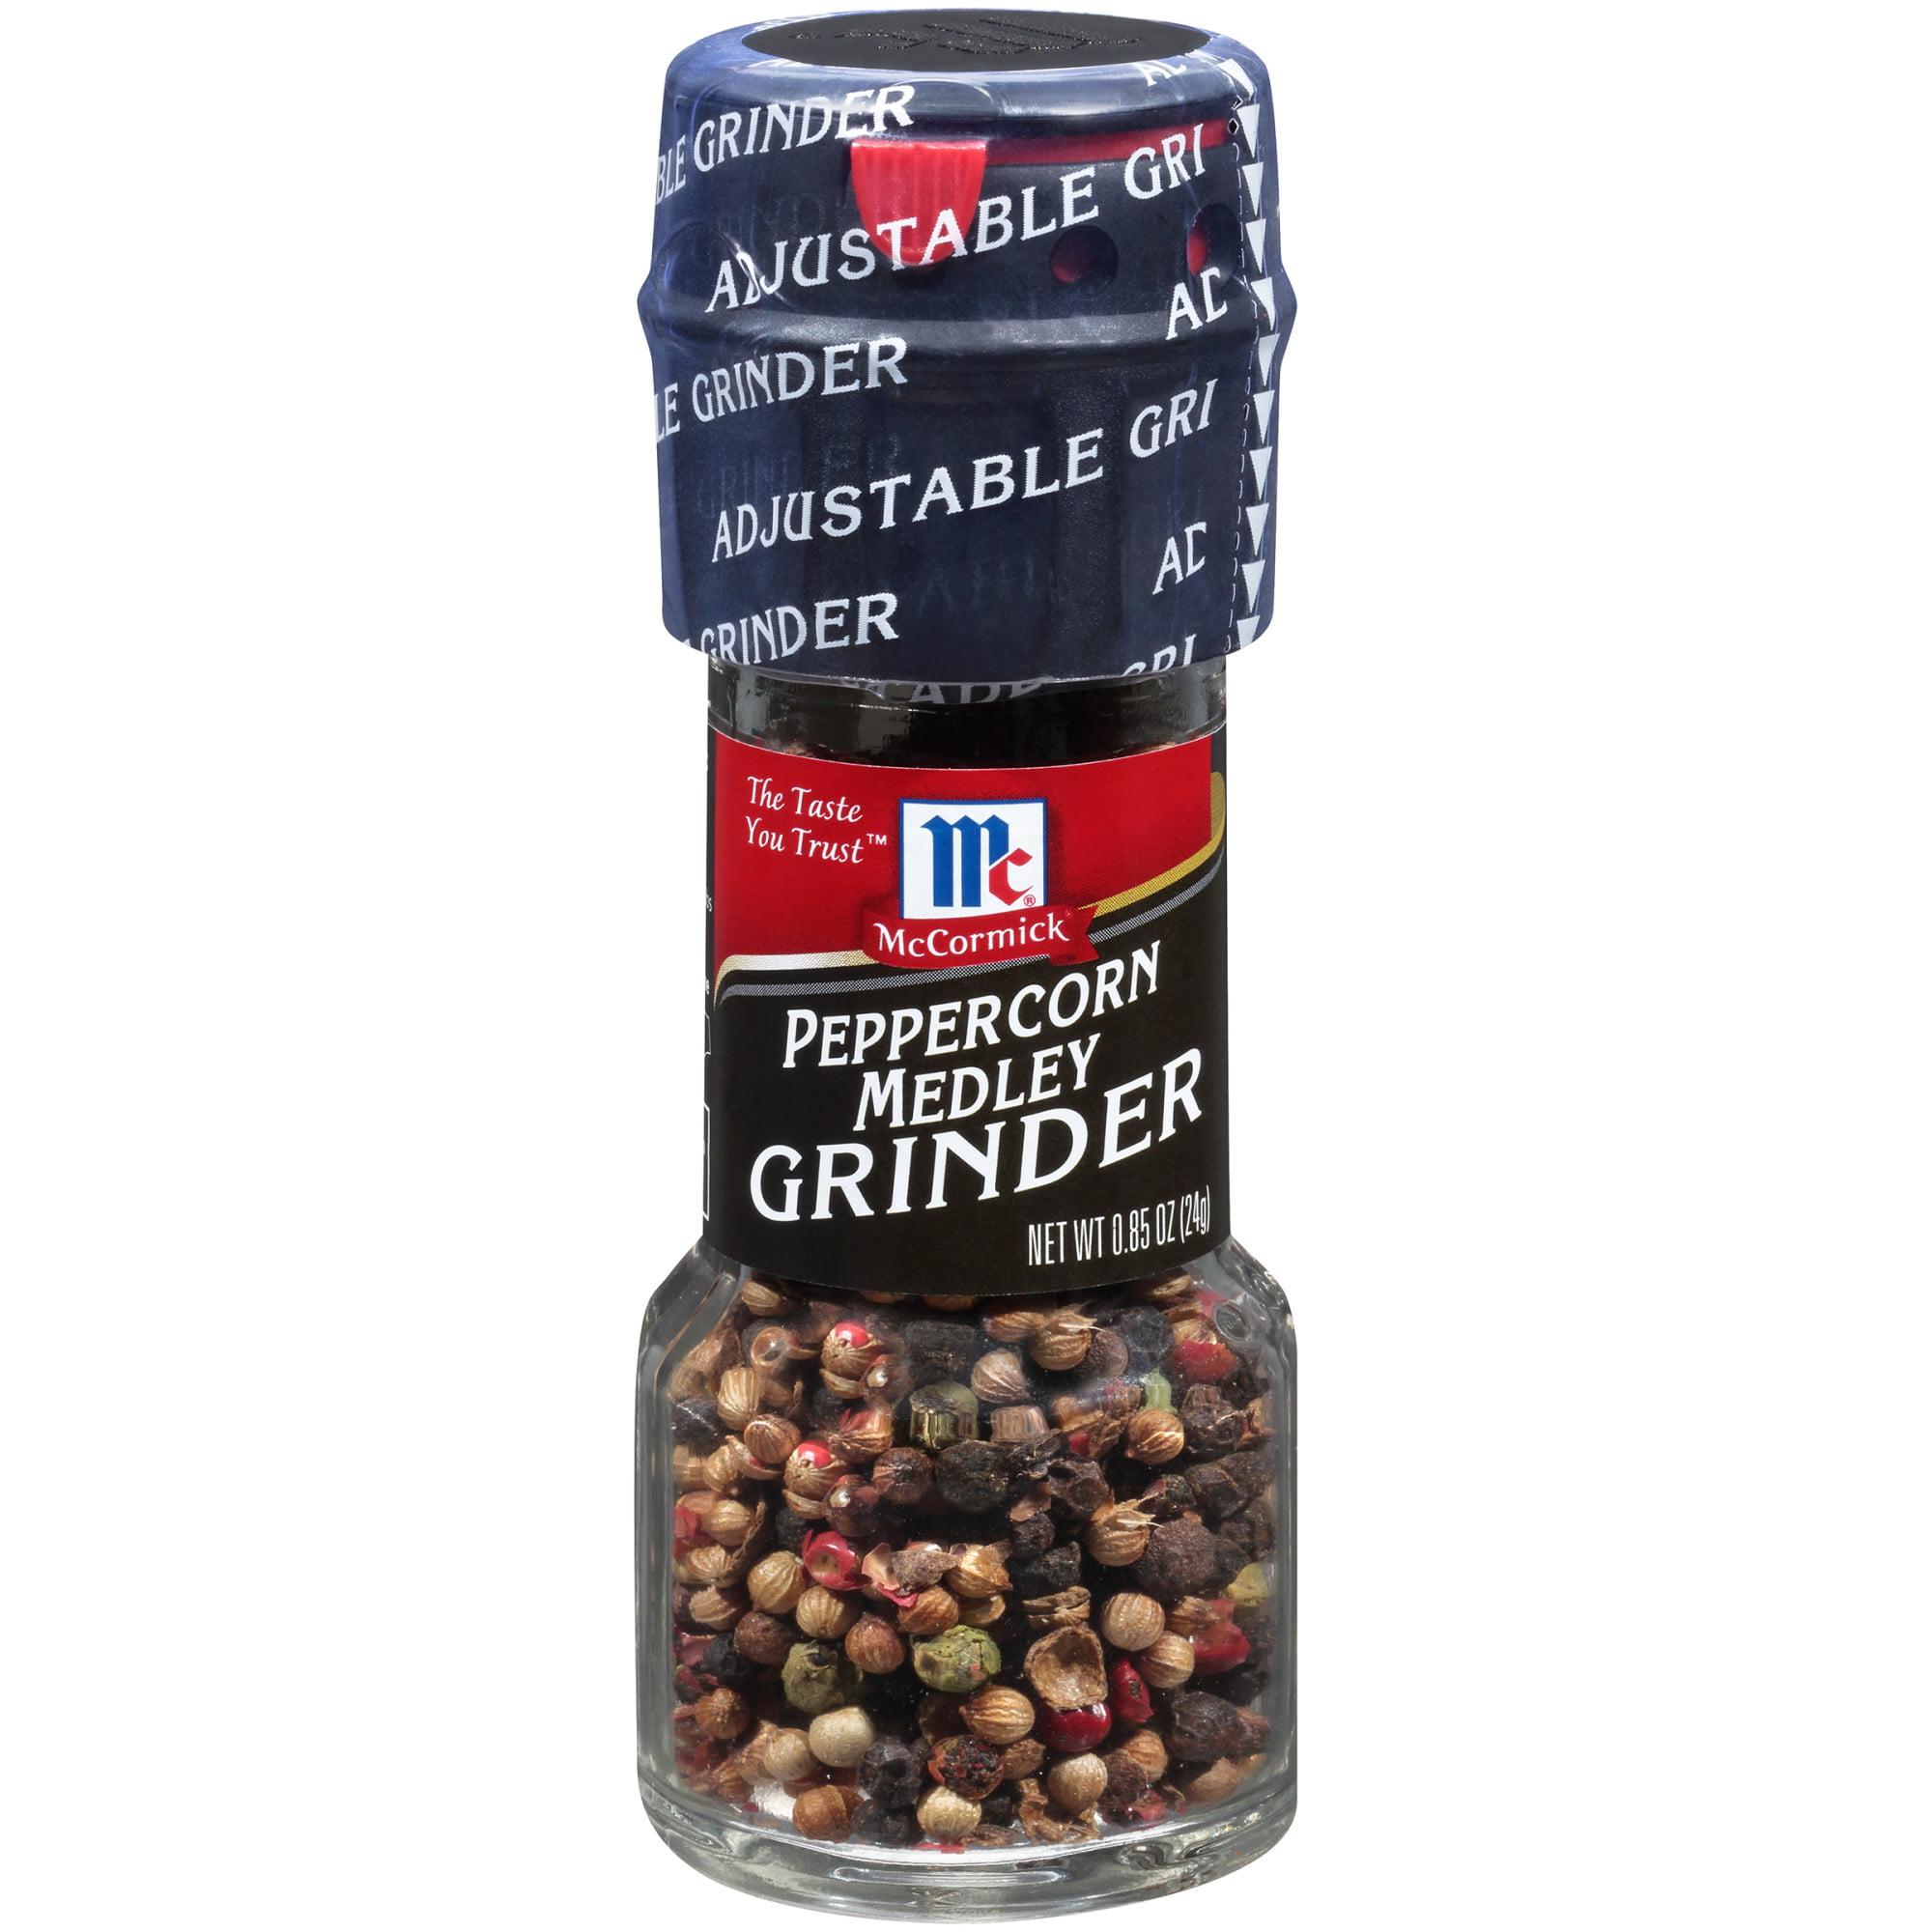 (3 Pack) McCormick Peppercorn Medley Grinder, 0.85 oz